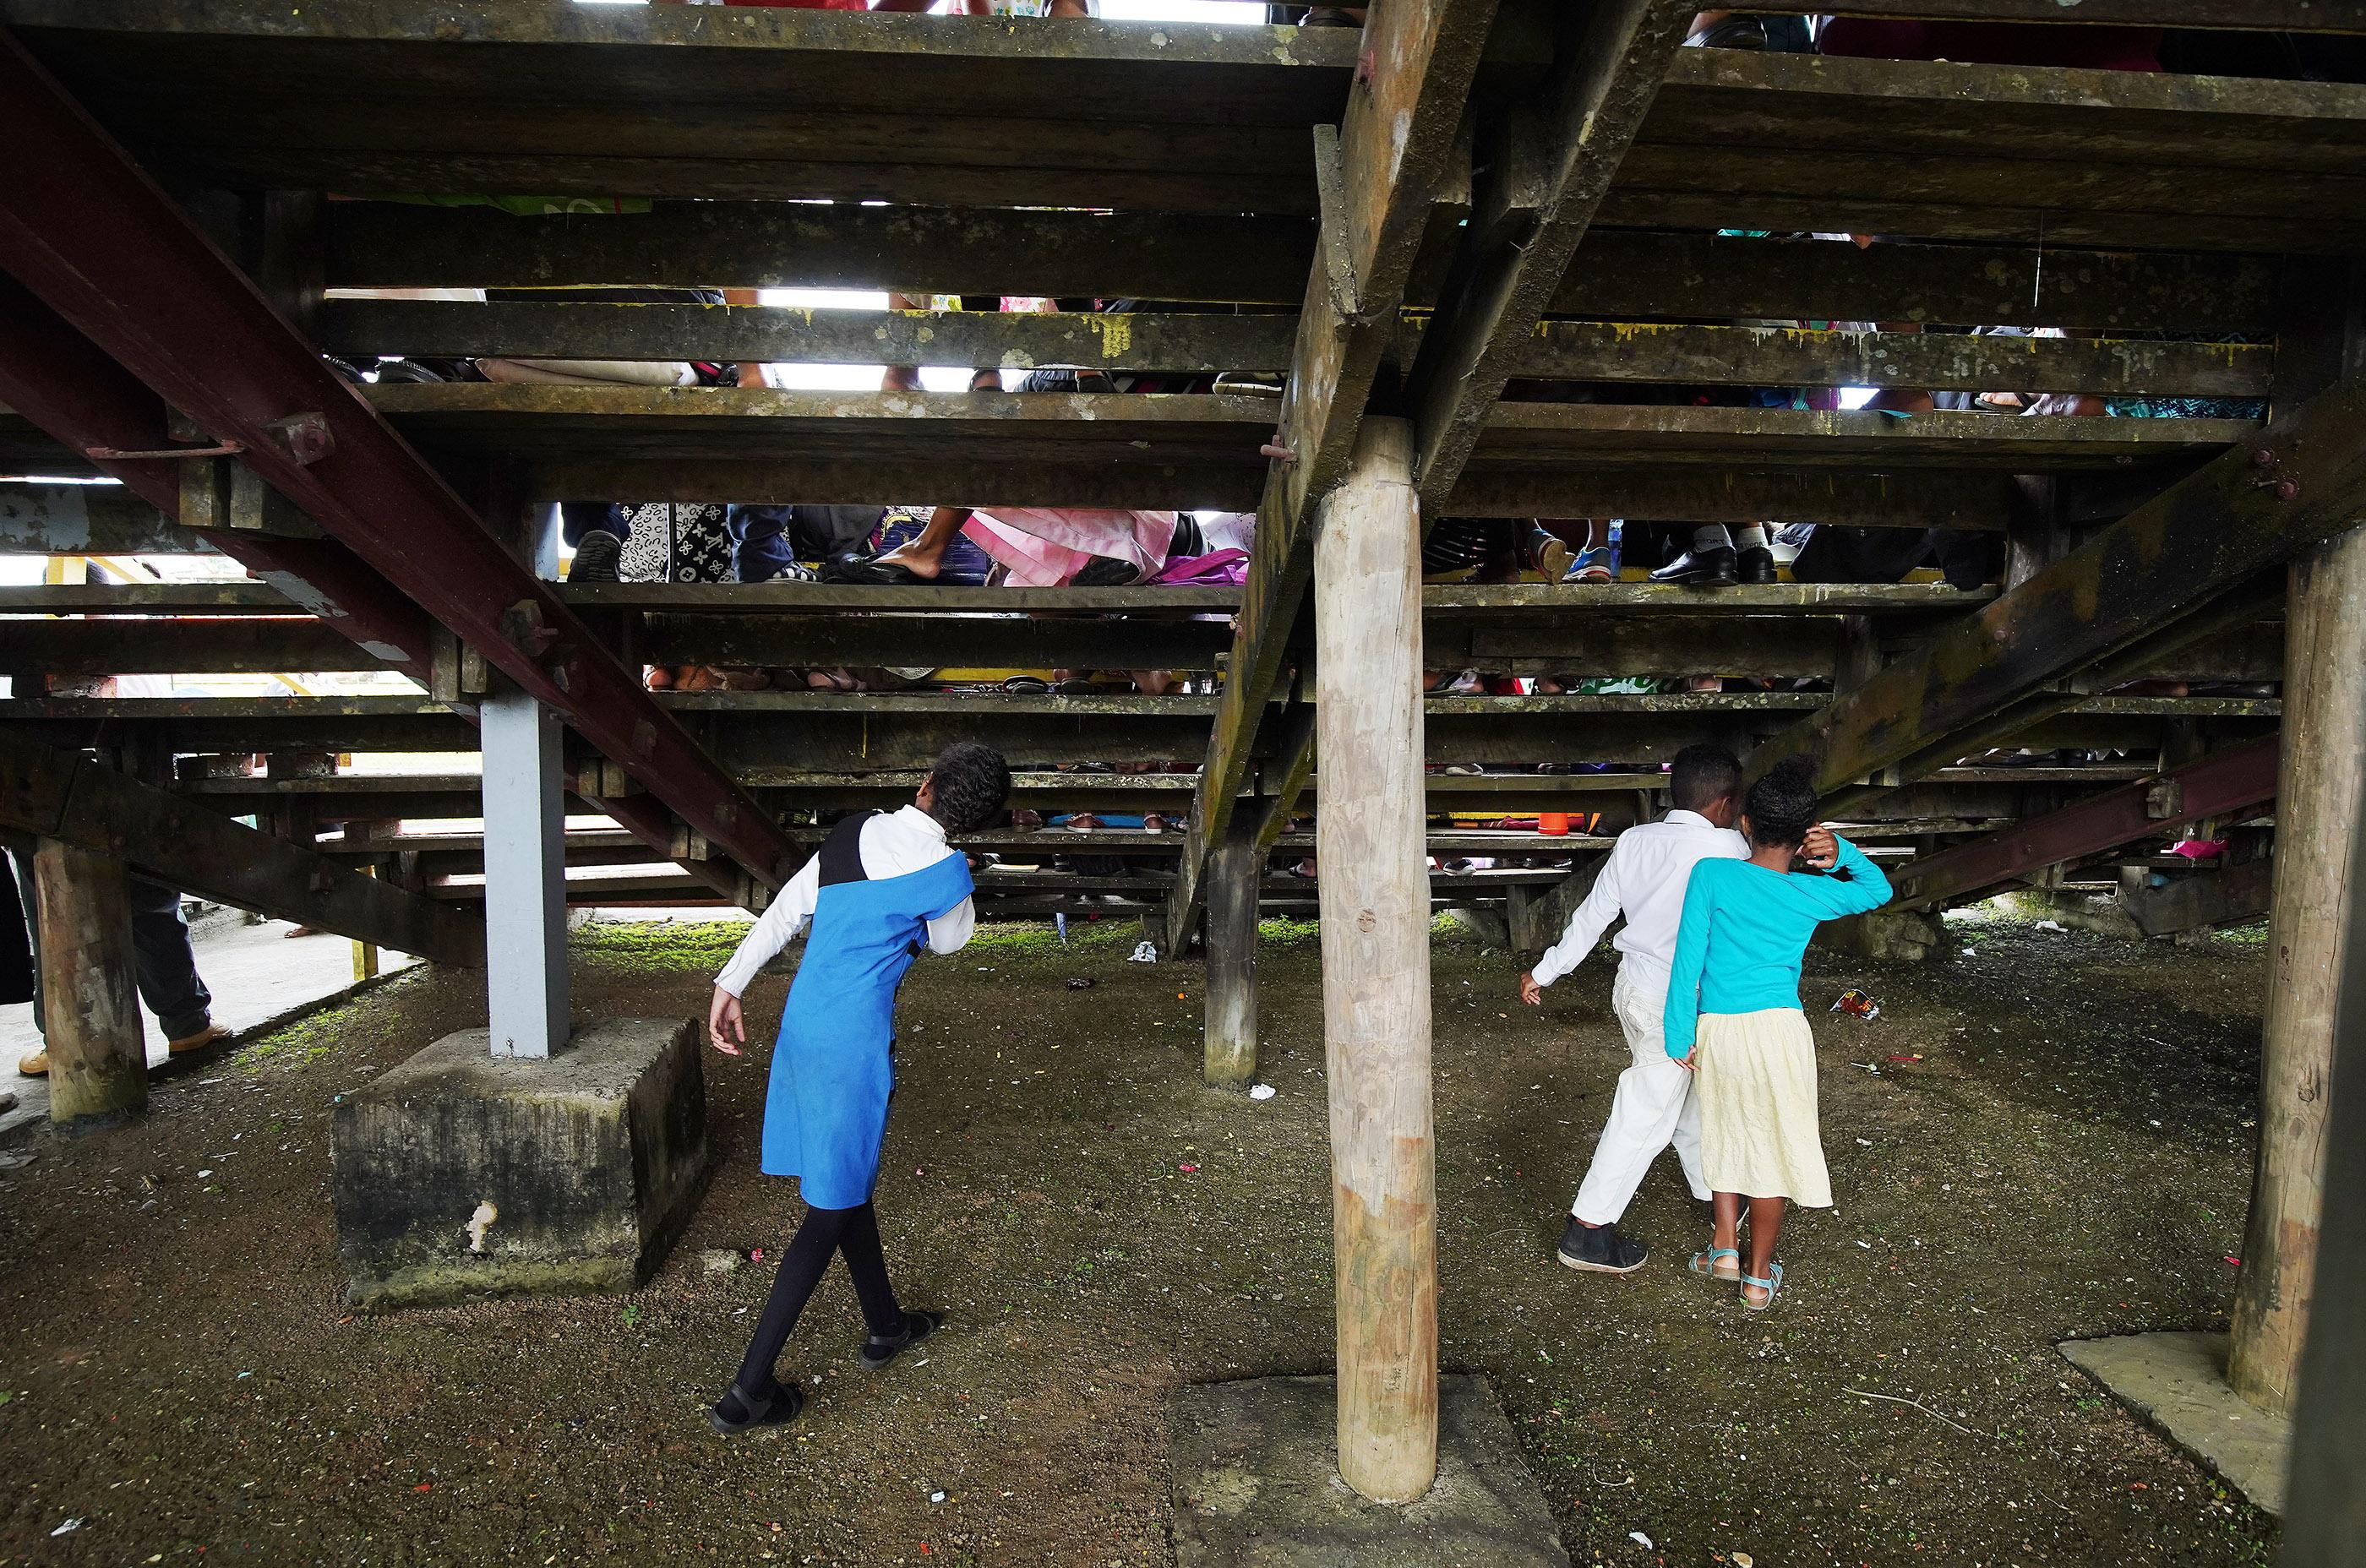 Children play under the bleachers during a devotional at Ratu Cakobau stadium in Nausori, Fiji on May 22, 2019.